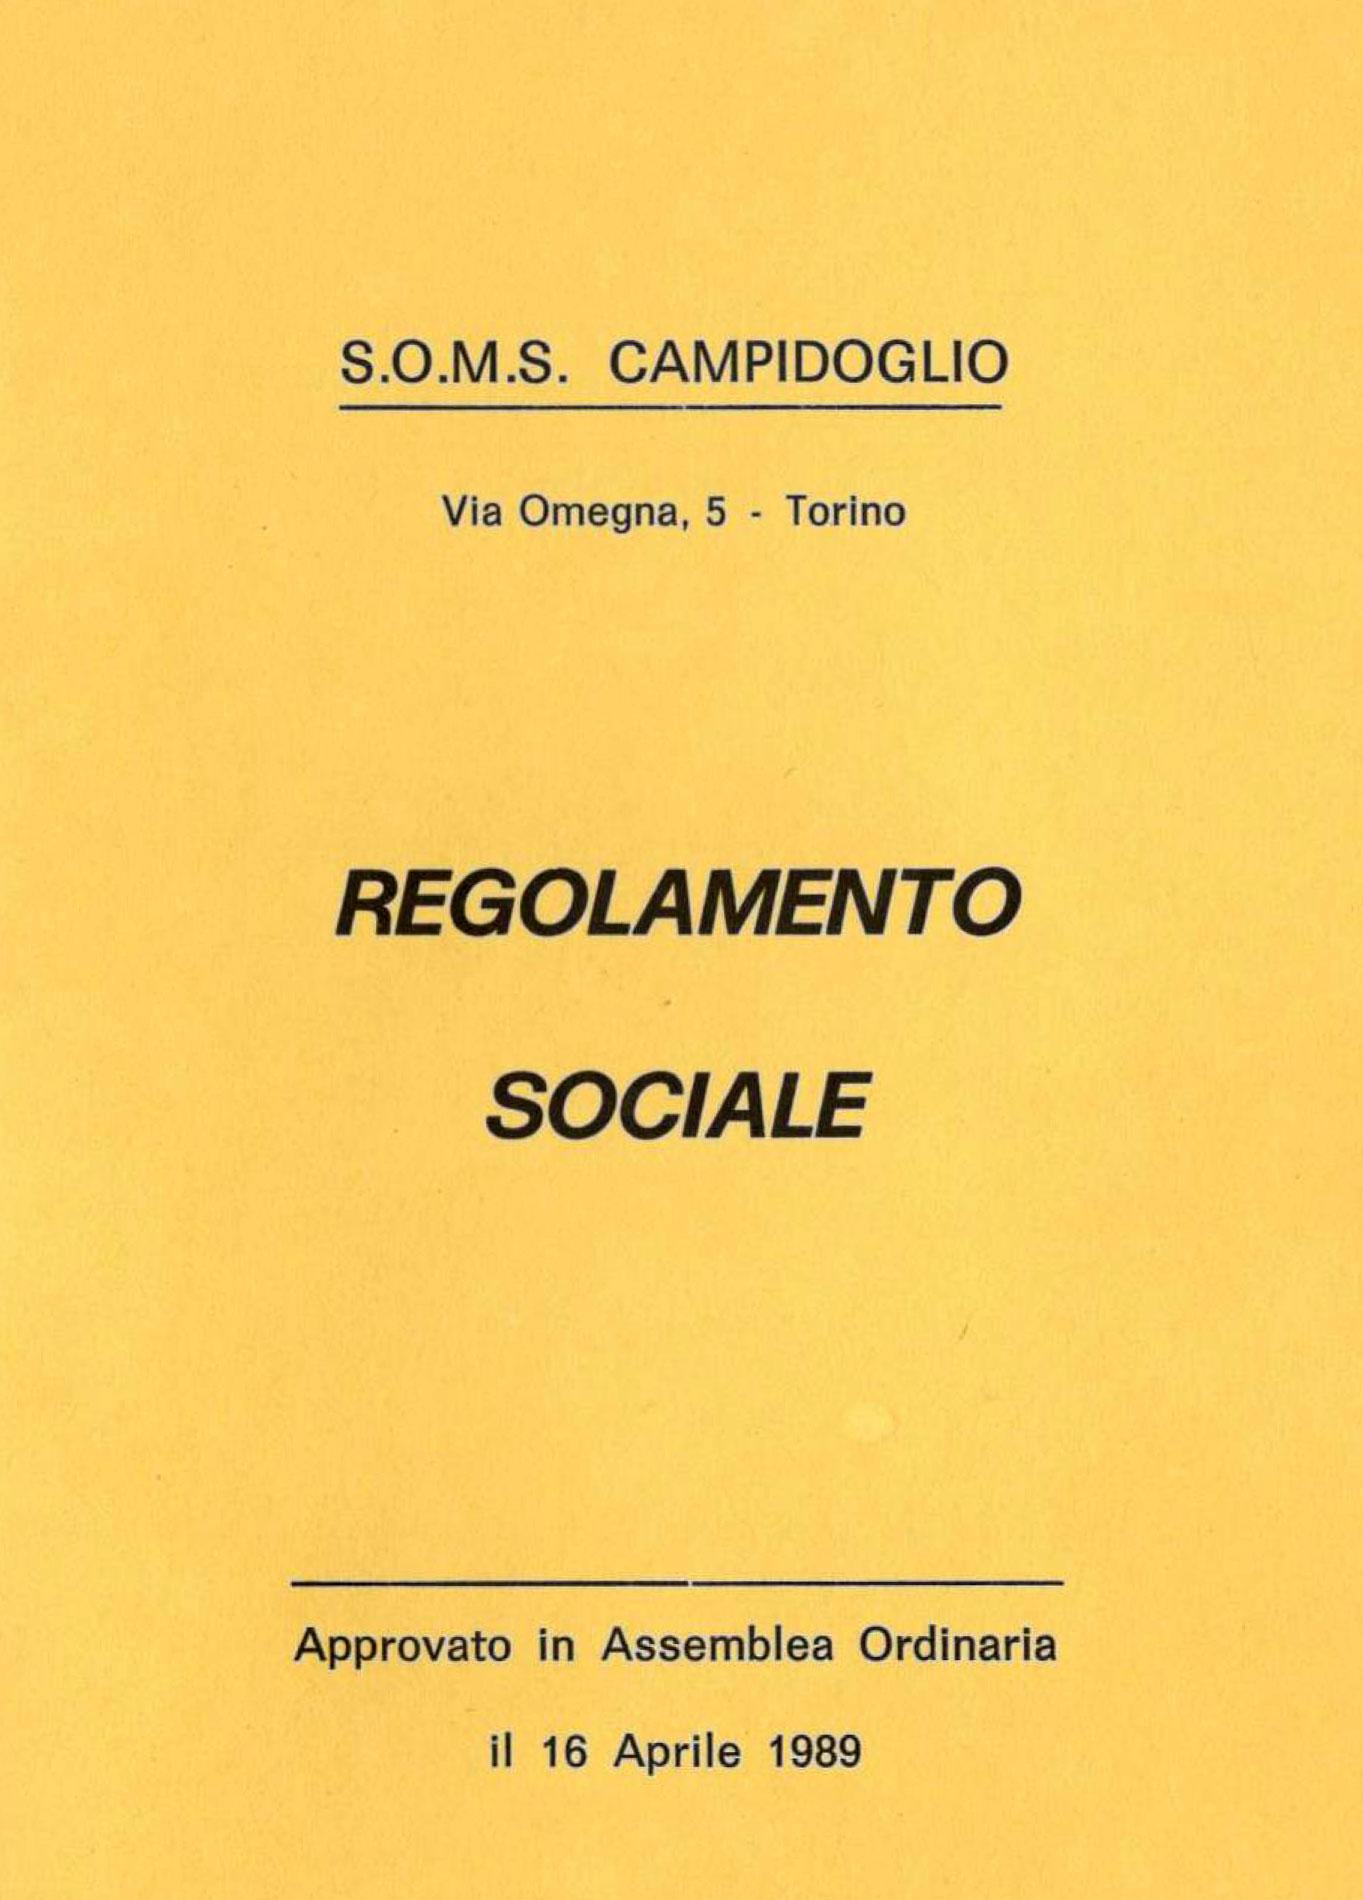 Regolamento sociale SOMS Campidoglio